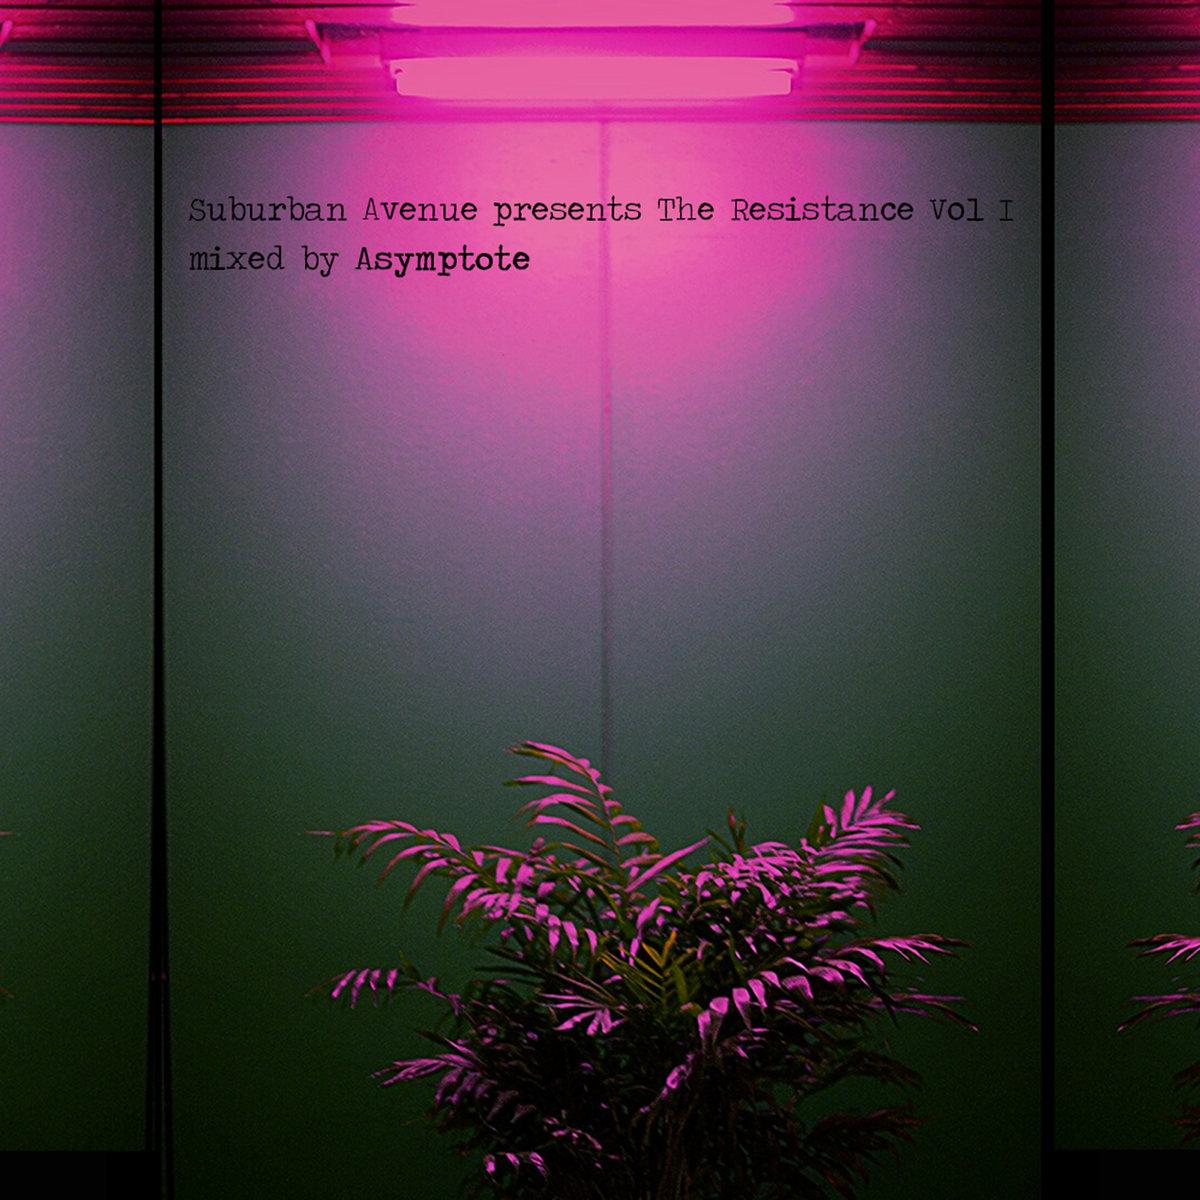 [Image: a0854519447_10.jpg]